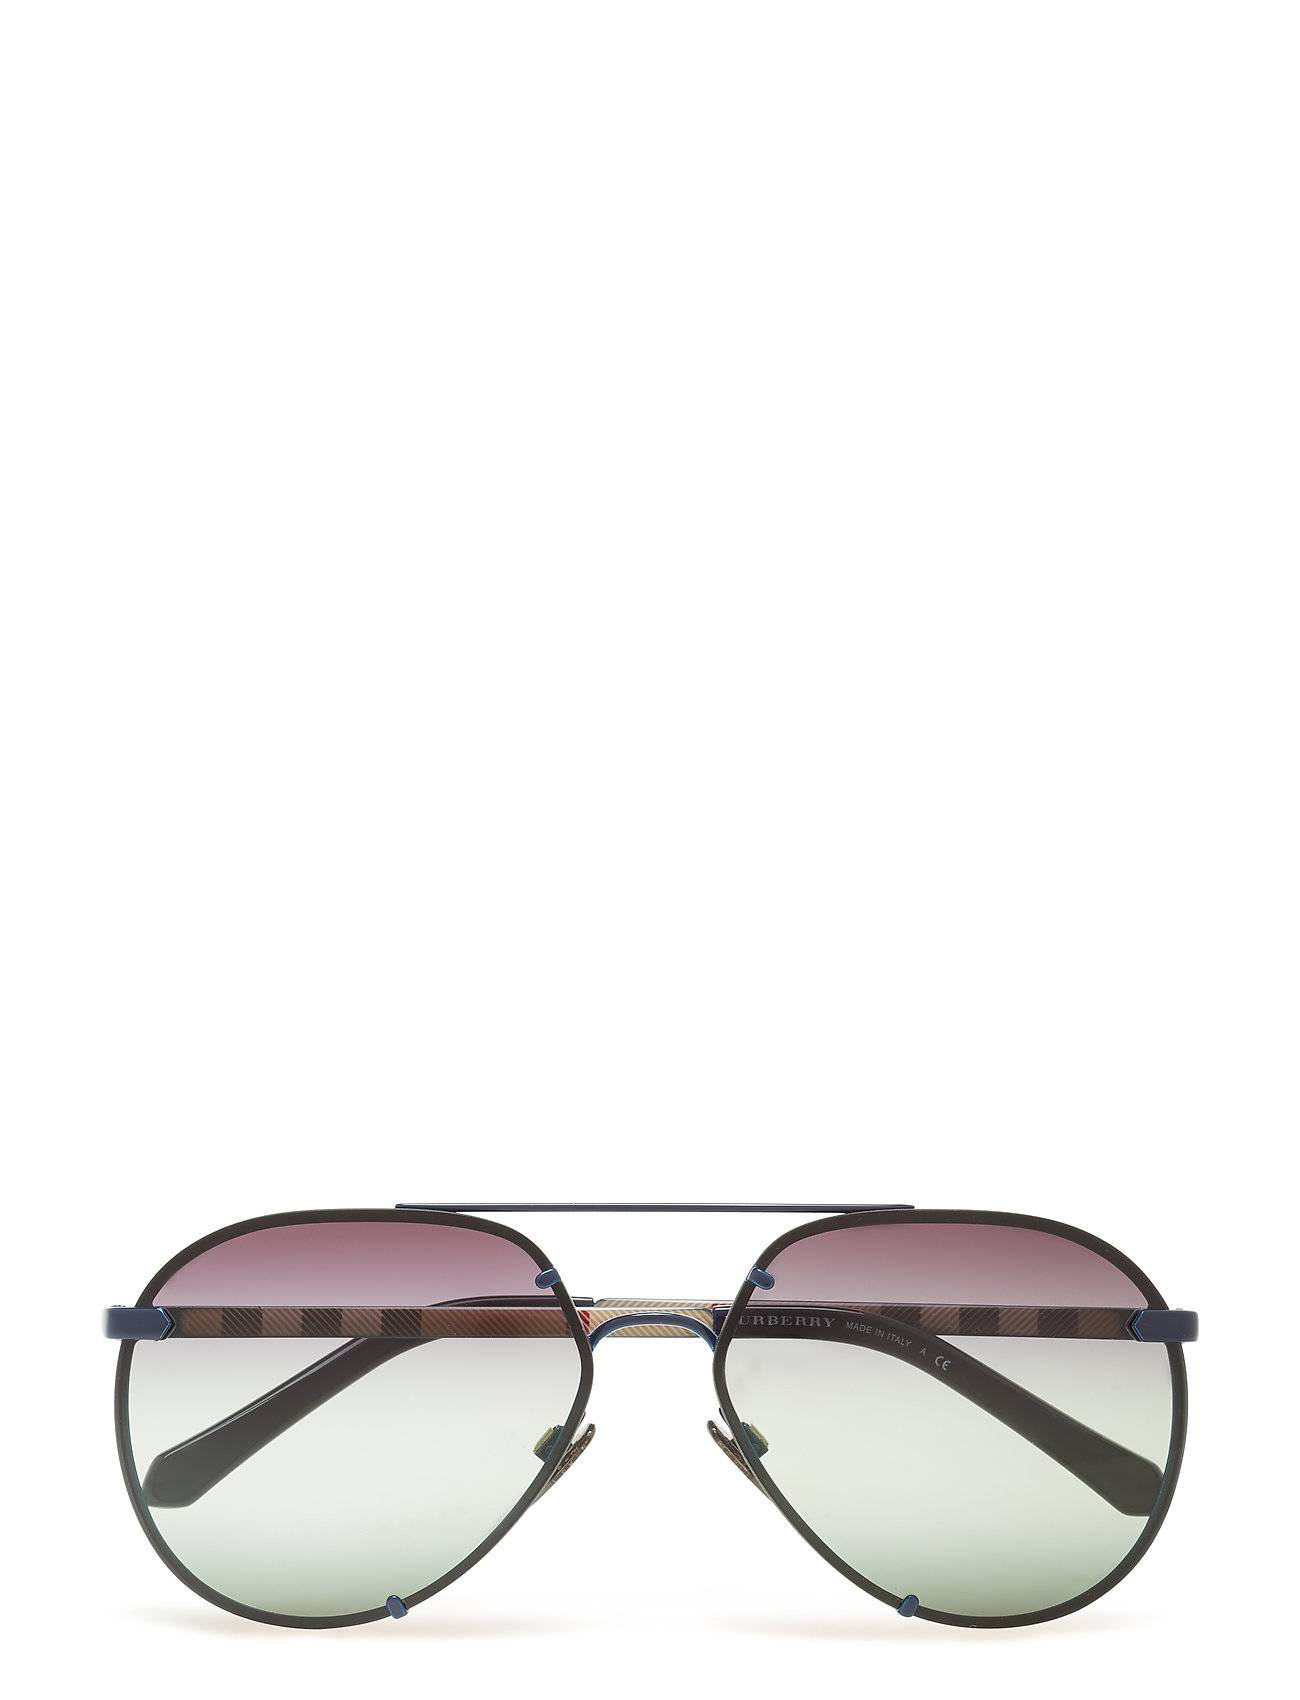 Image of Burberry Sunglasses 0be3099 Pilottilasit Aurinkolasit Musta Burberry Sunglasses